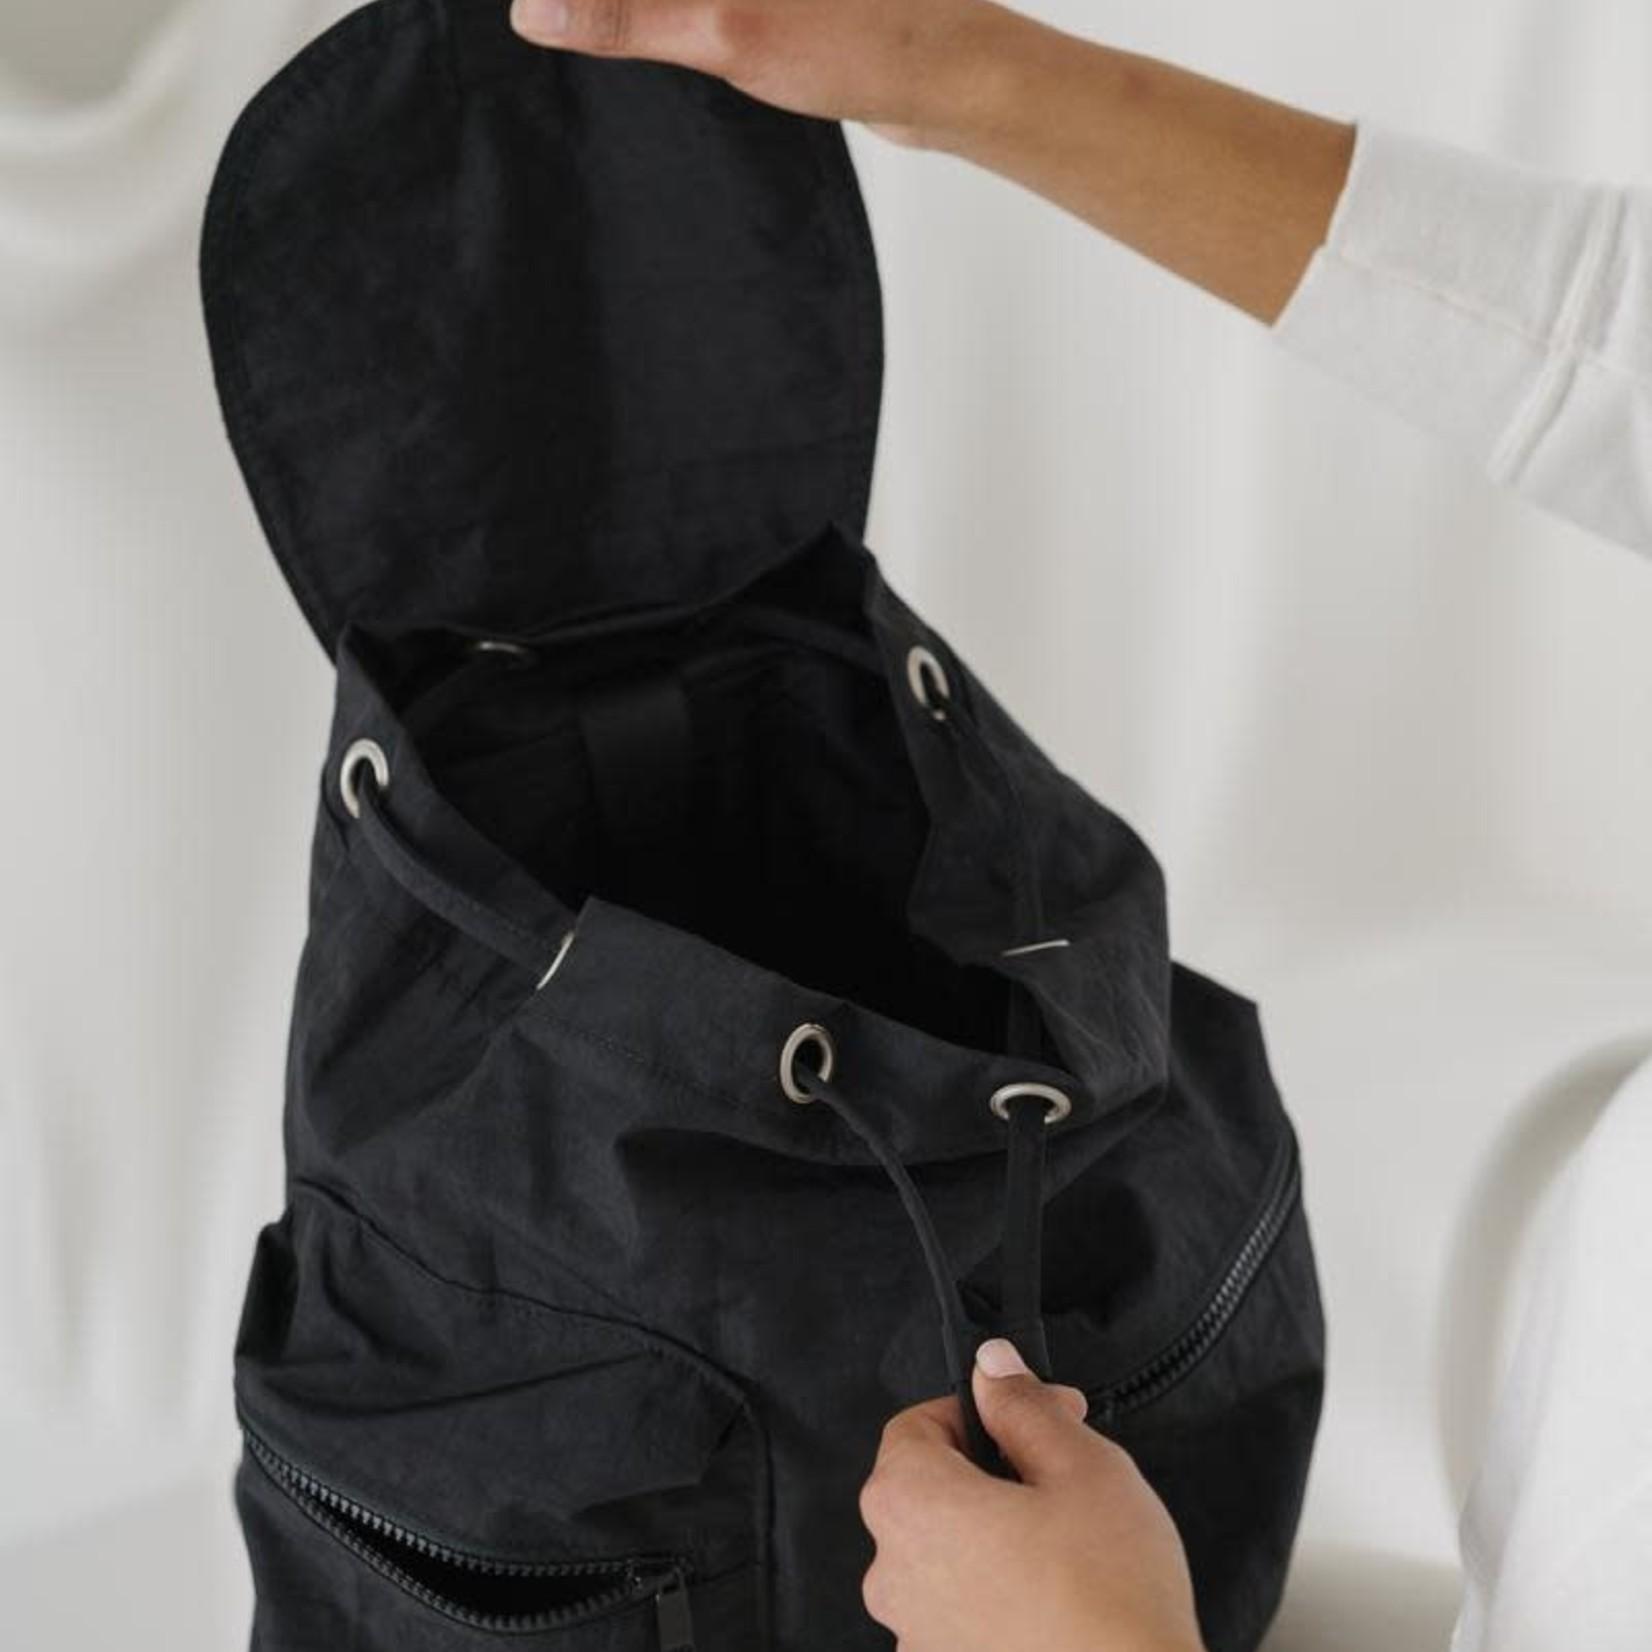 Baggu Baggu Sport Backpack Black Small